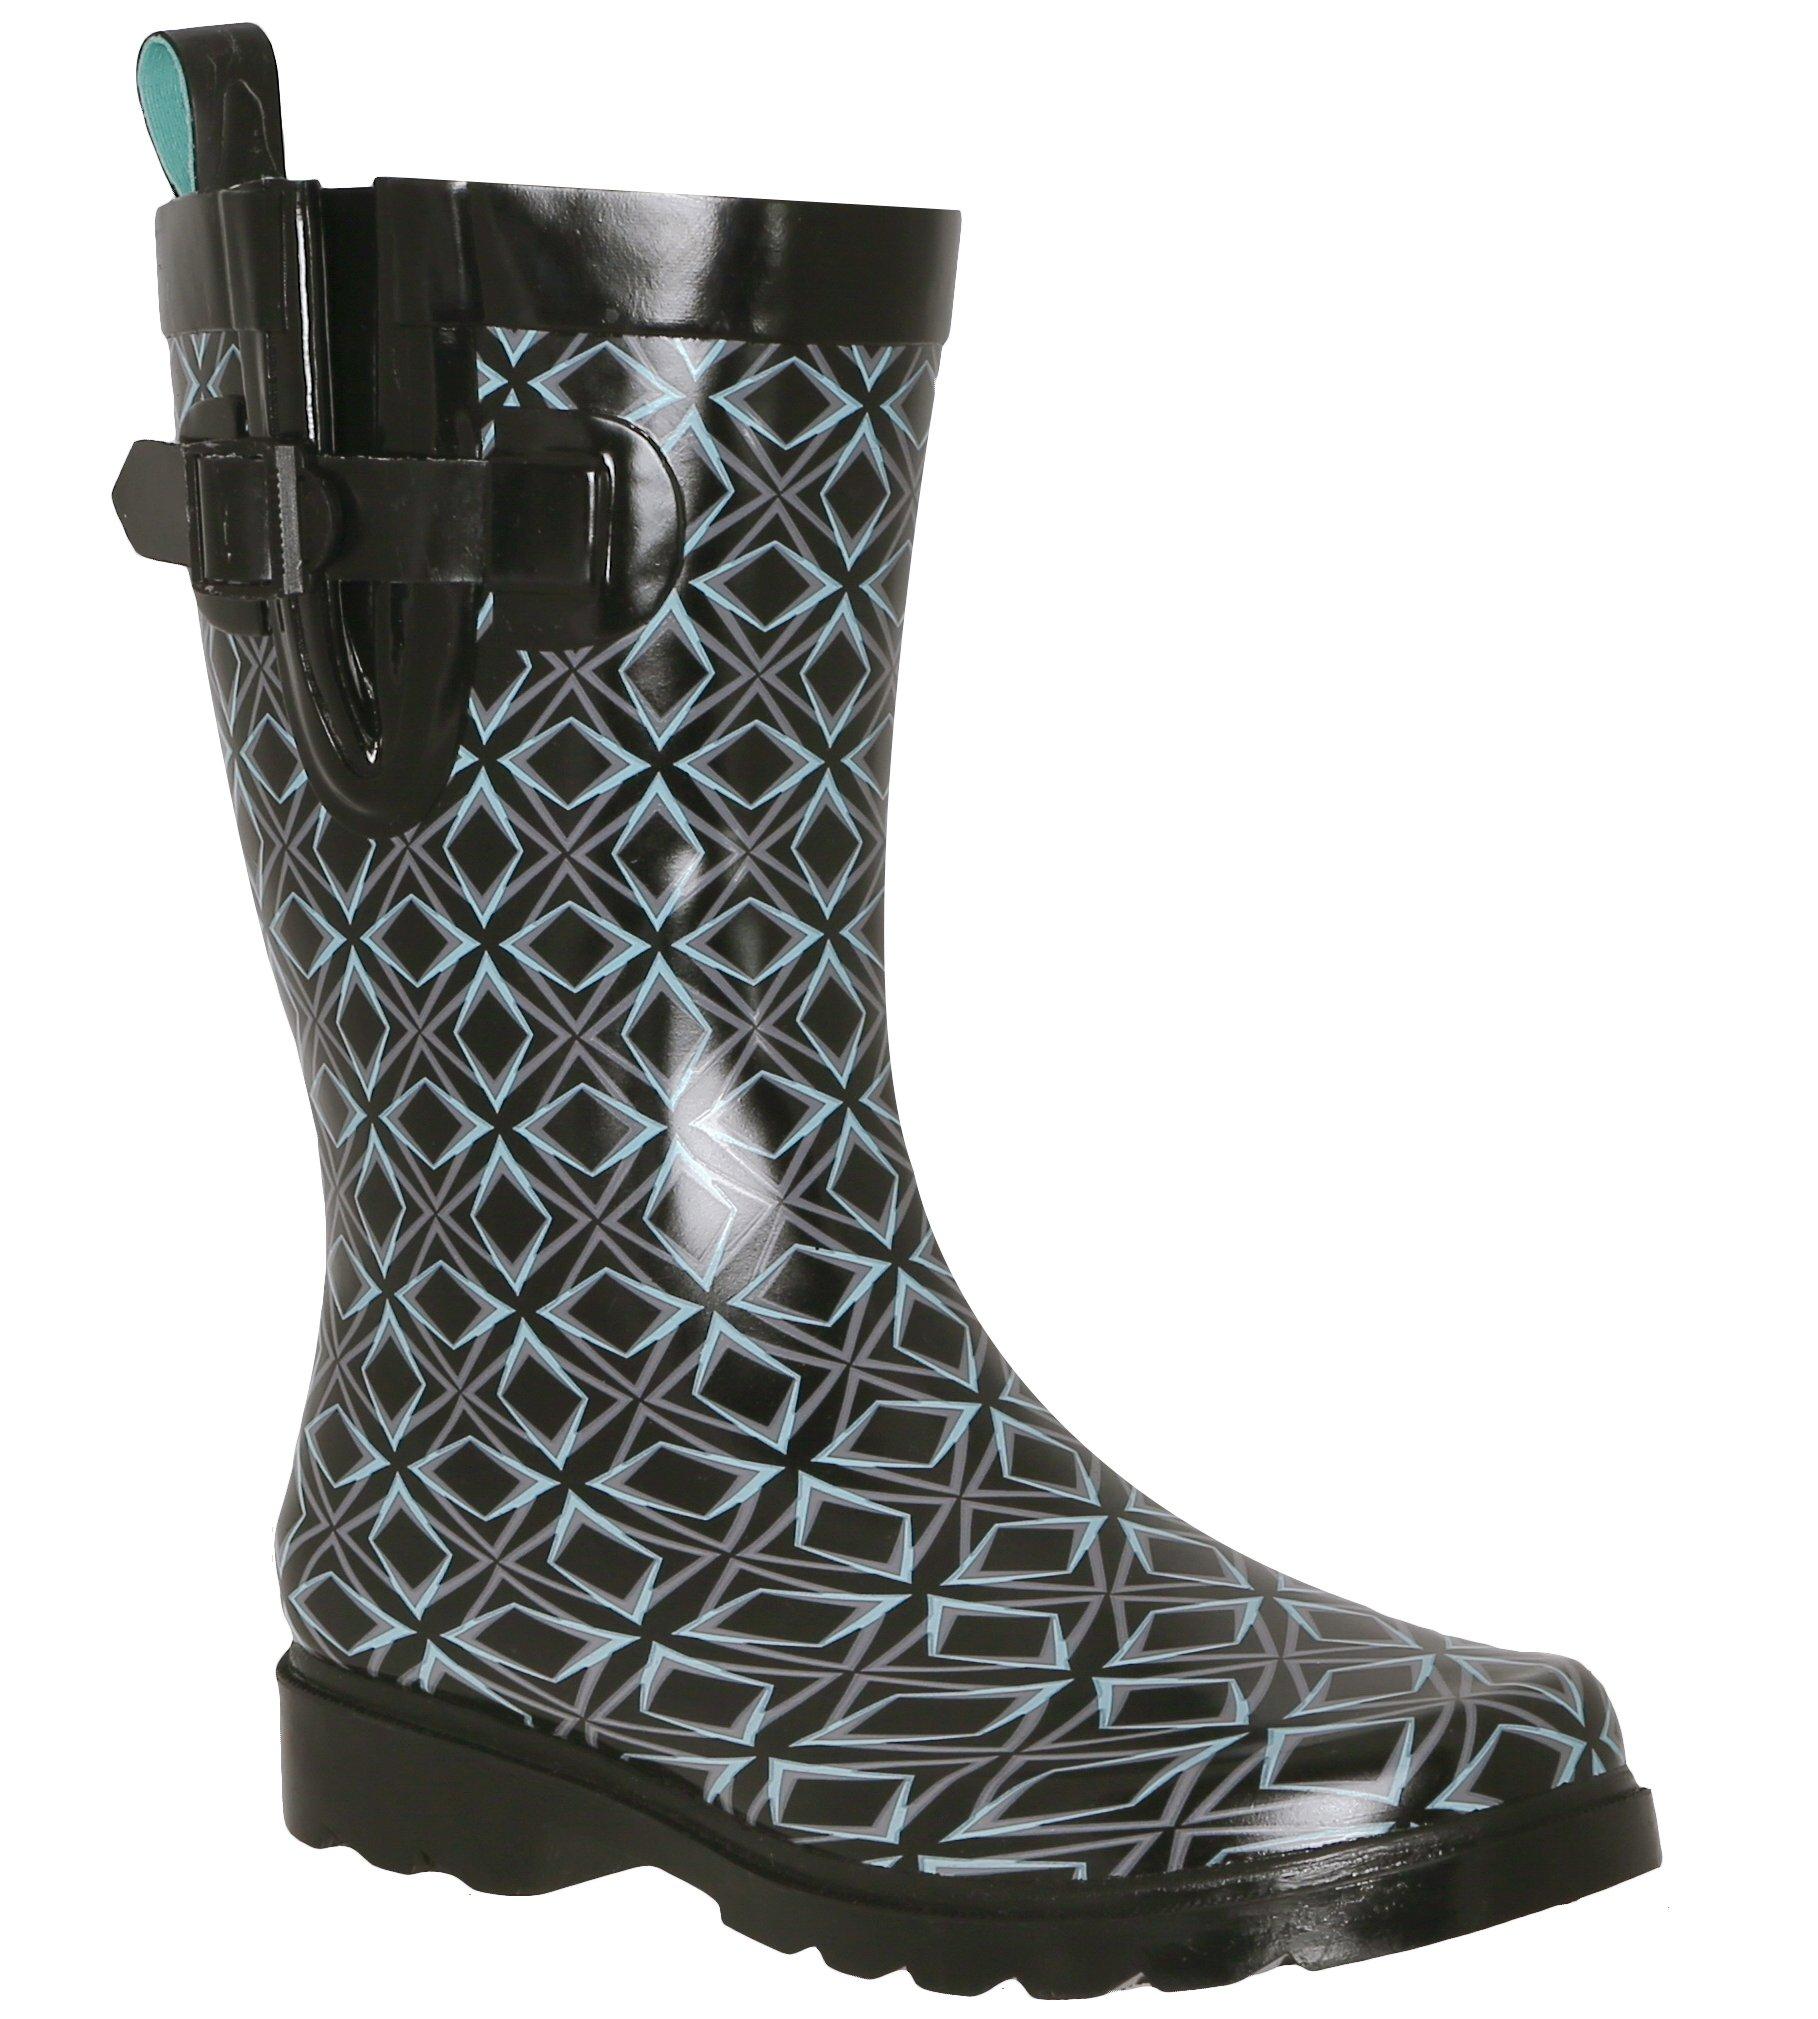 Capelli New York Ladies Geo Diamond Printed Mid- Calf Rain Boot Black Combo 9